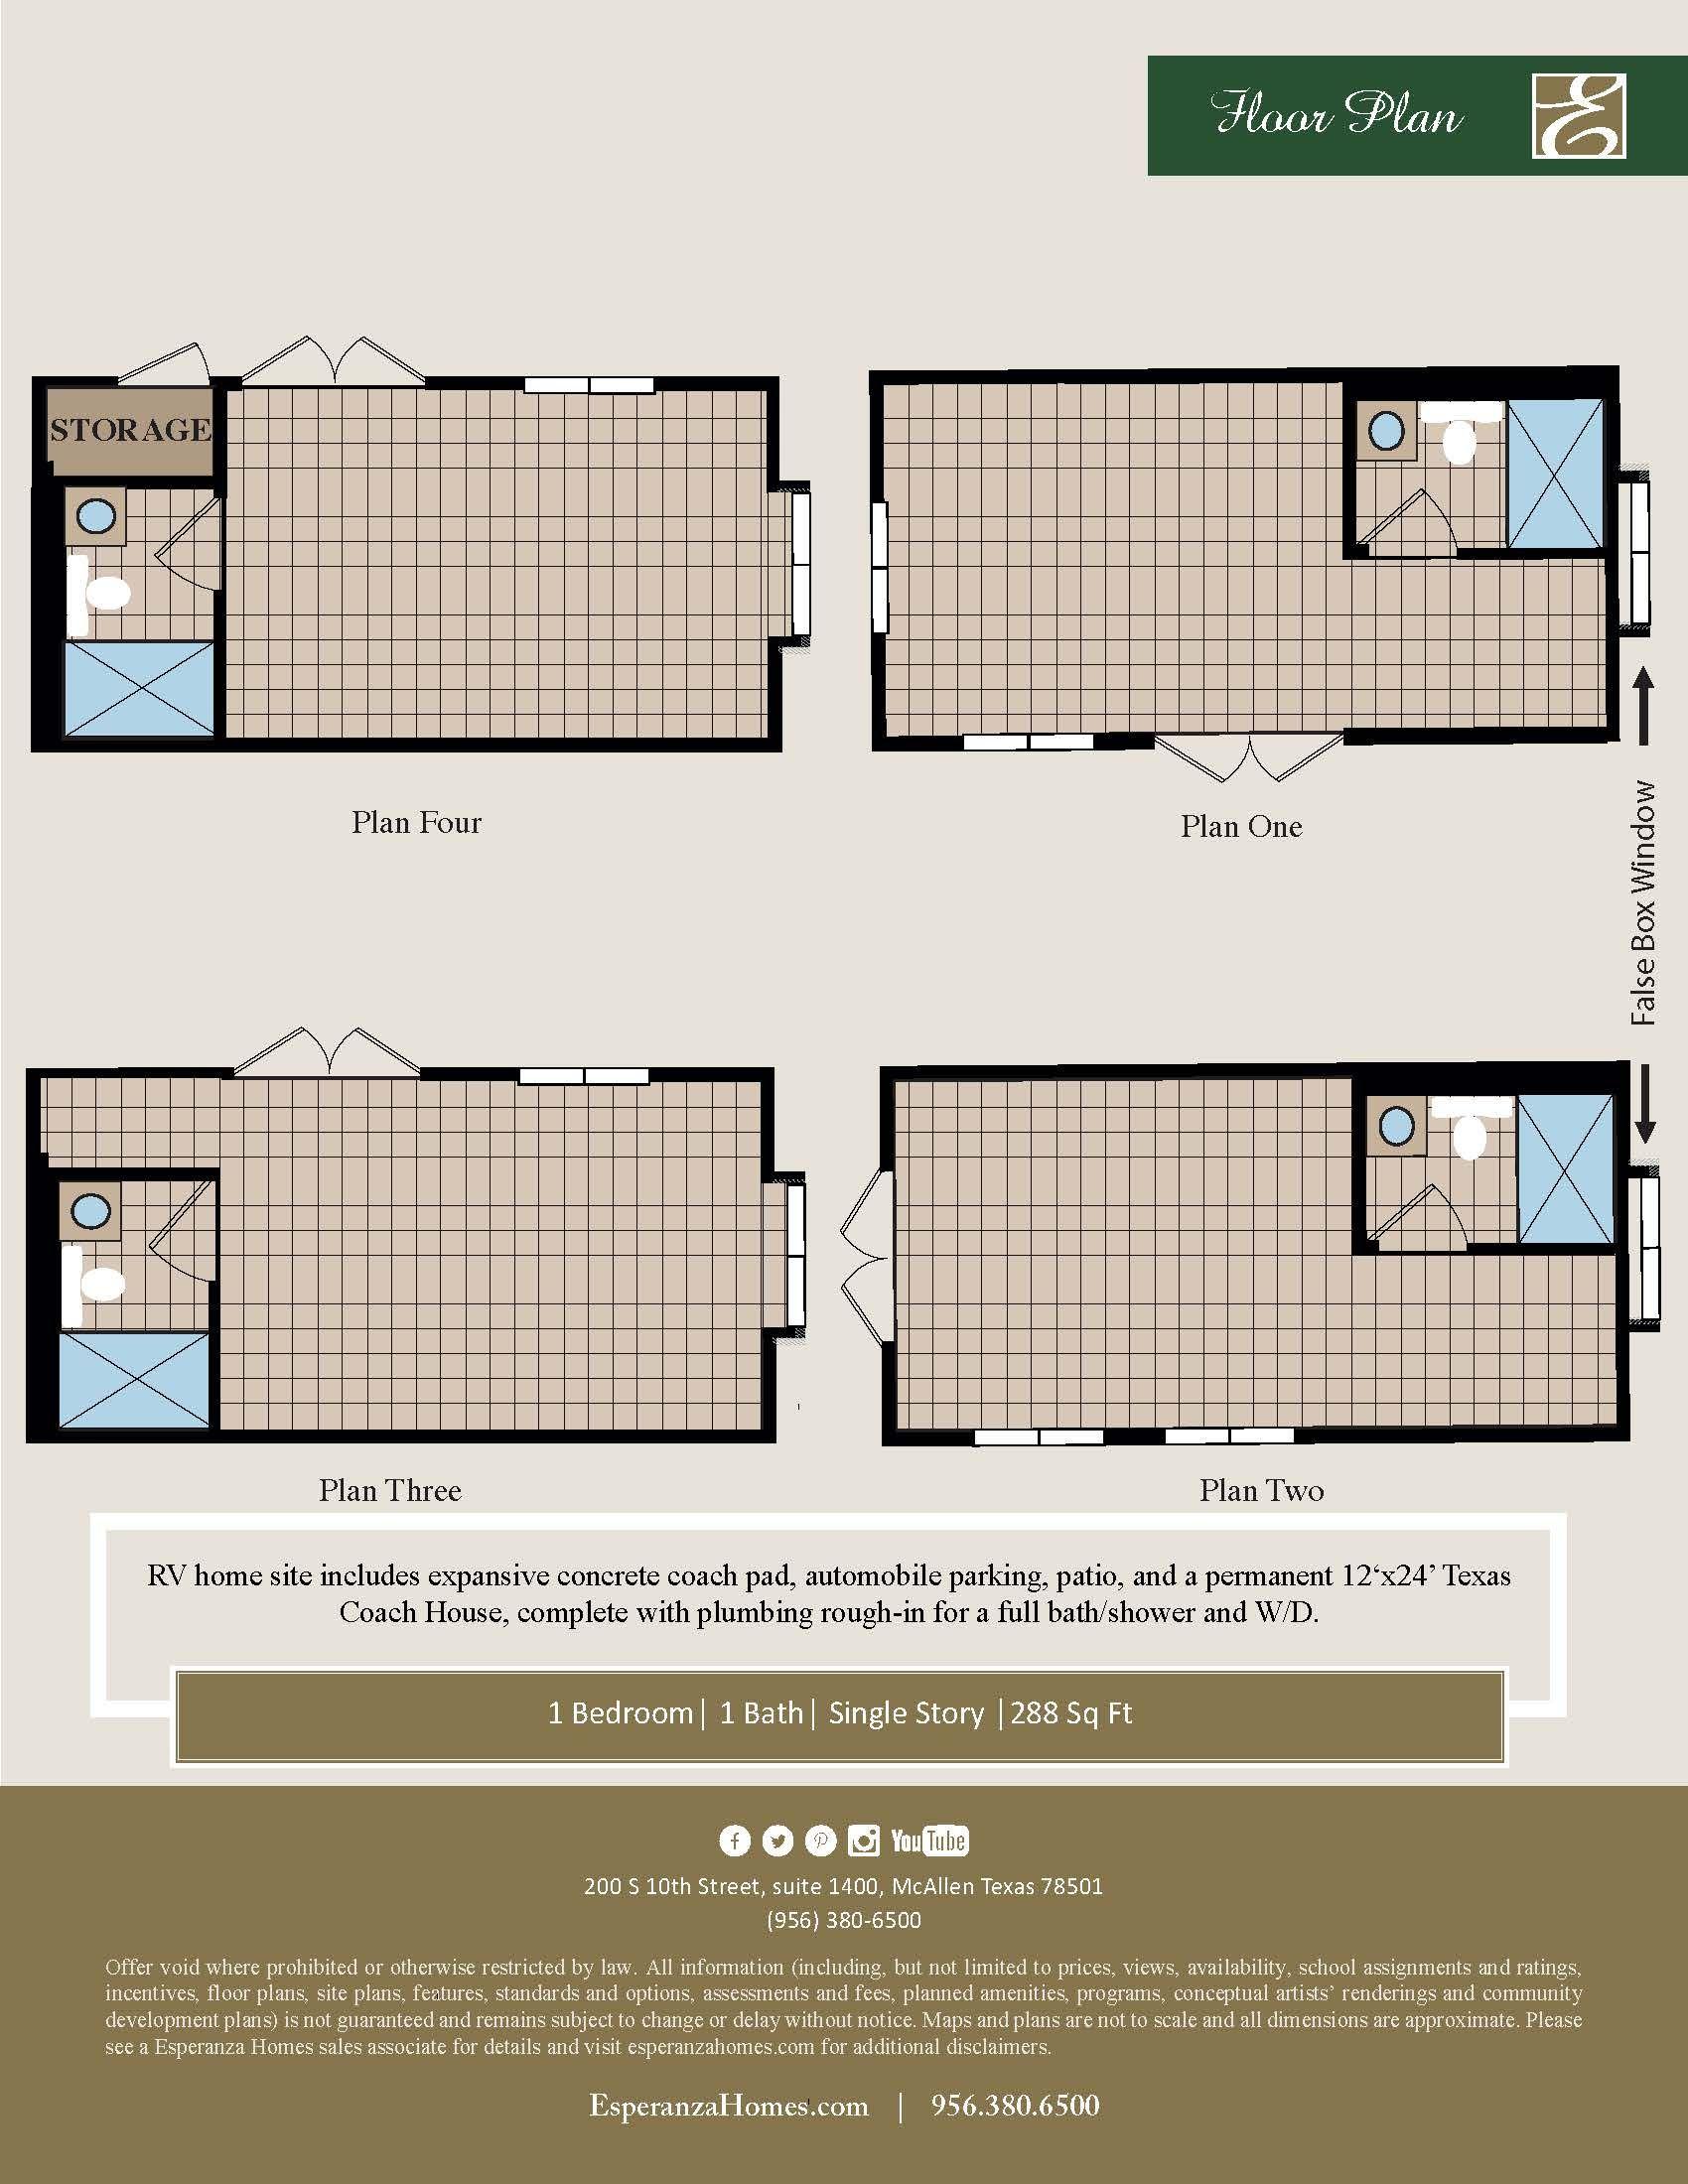 rv coach house plan mission texas 78572 rv coach house plan at retama village at bentsen palm by bentsen palm by esperanza home - Coach House Floor Plans